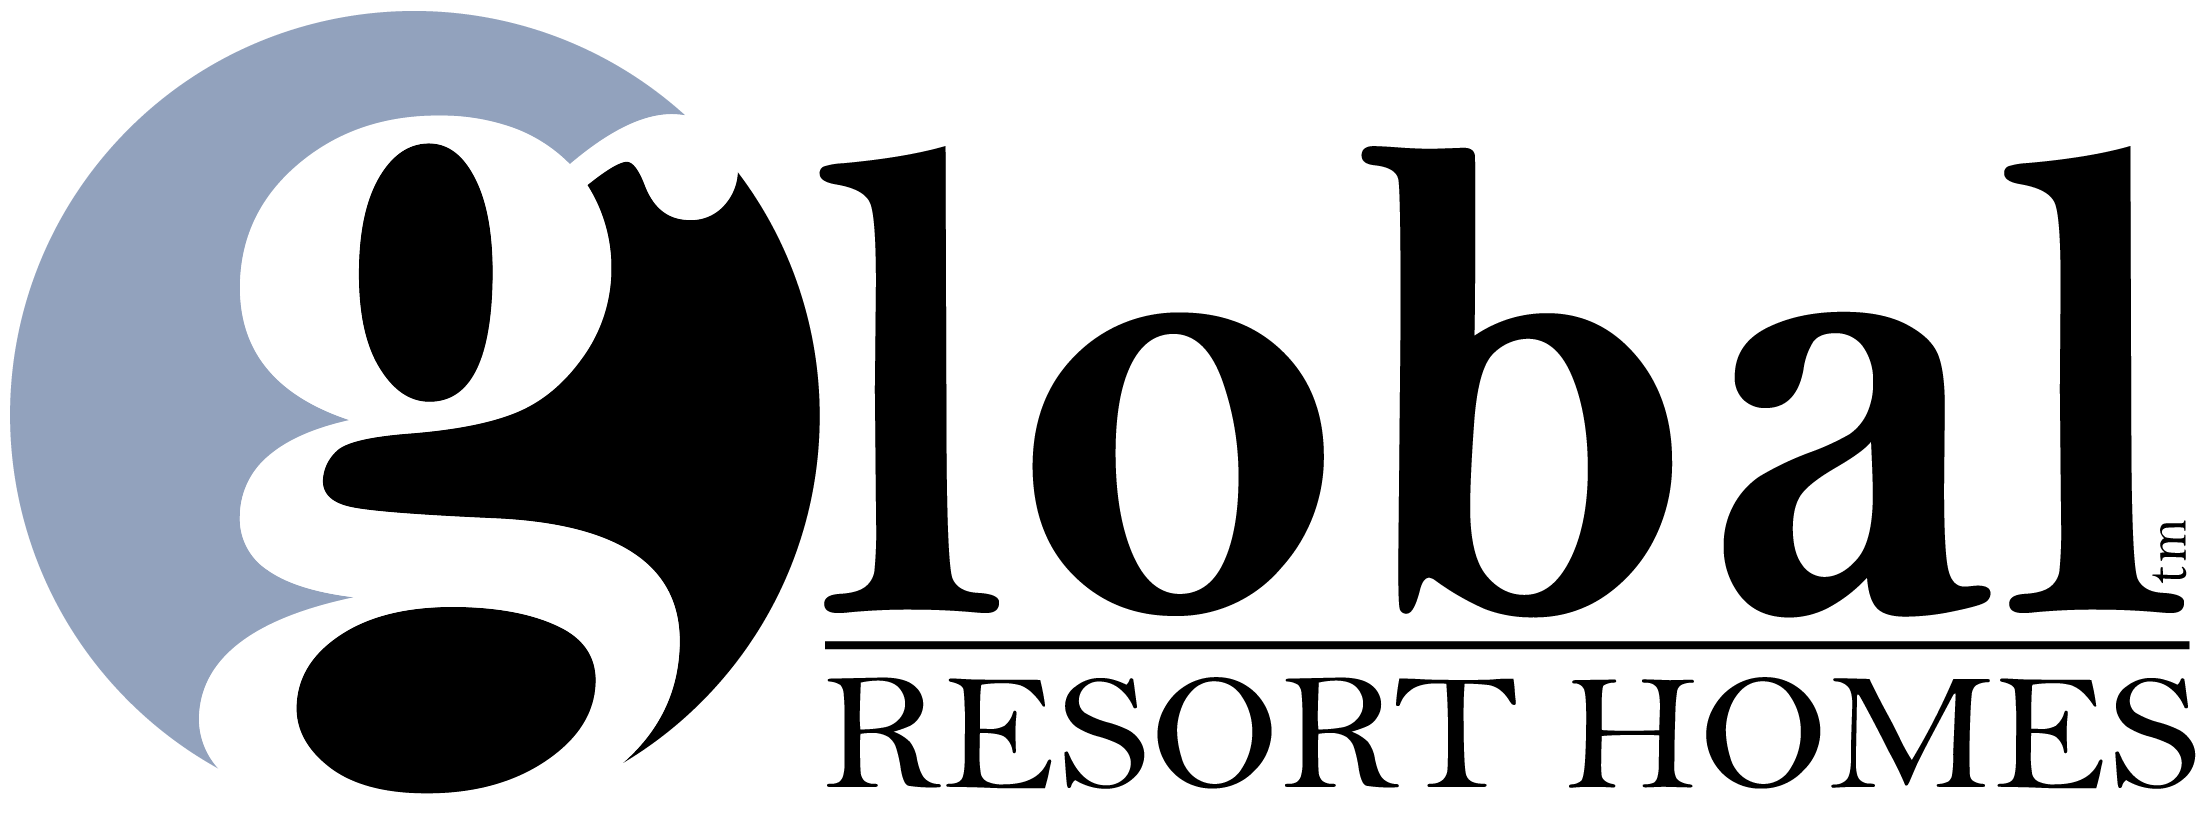 Global Resort Homes logo